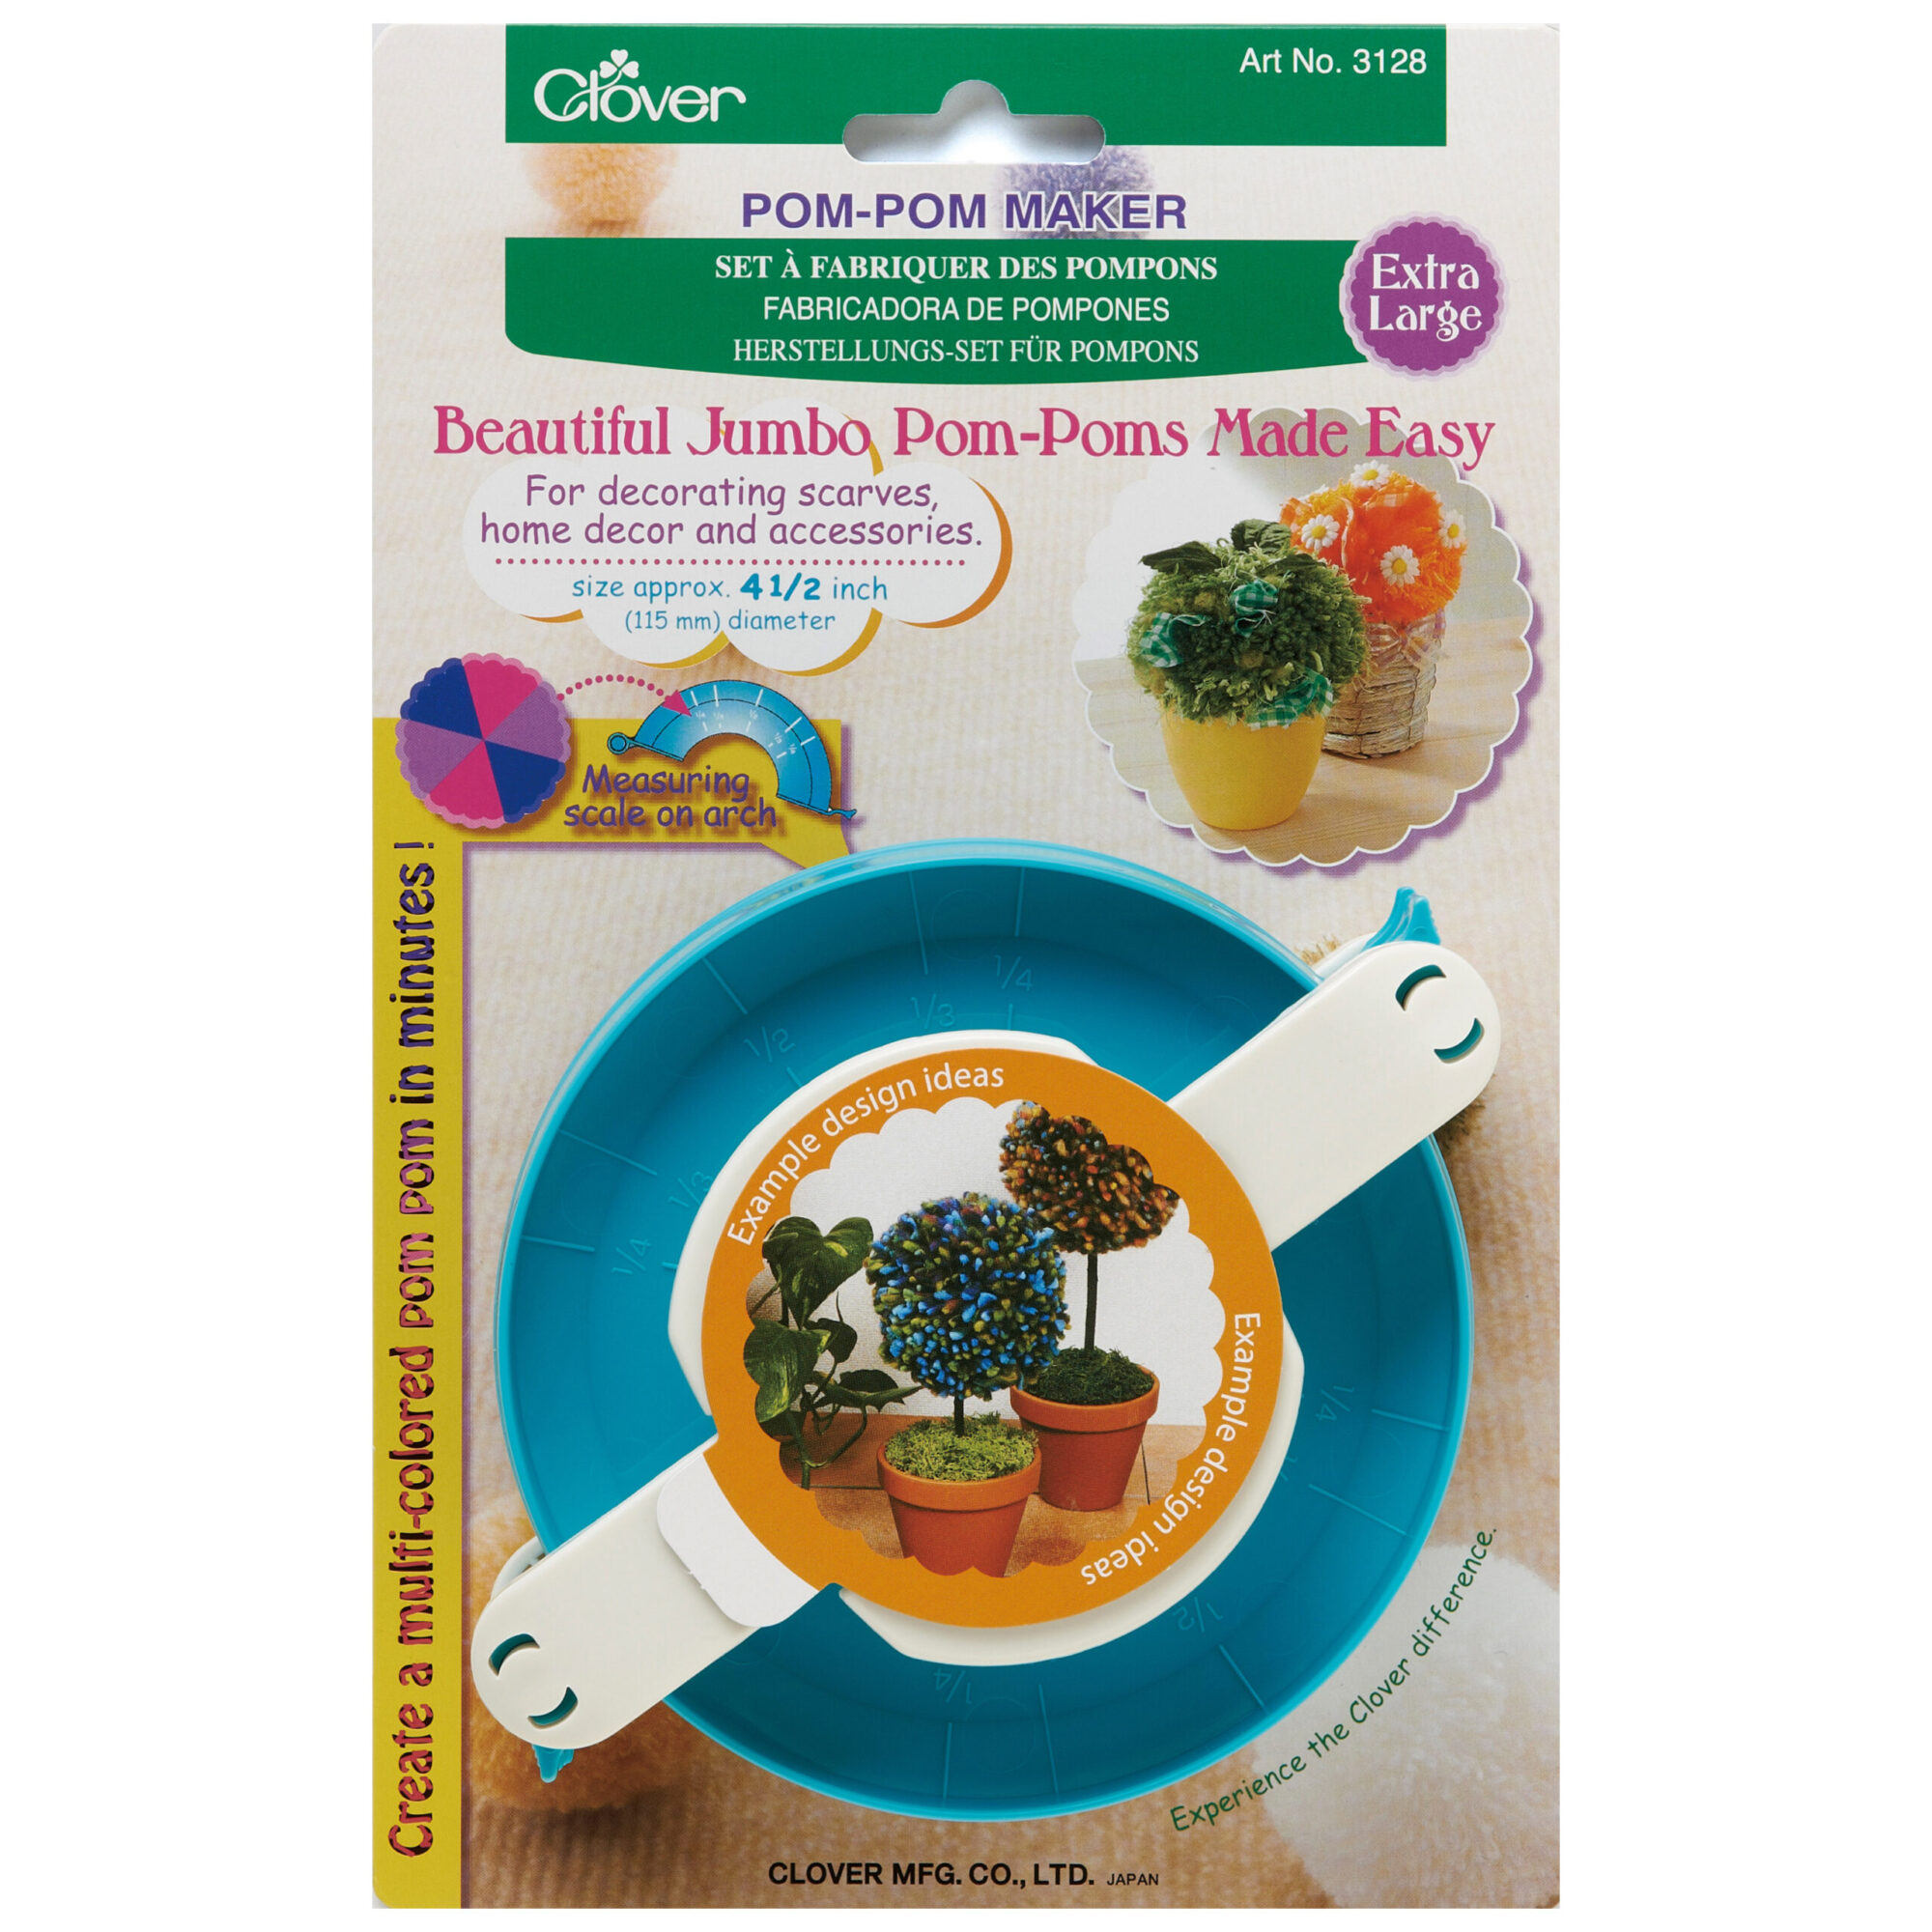 Clover Pom Pom Maker – Extra Large product image